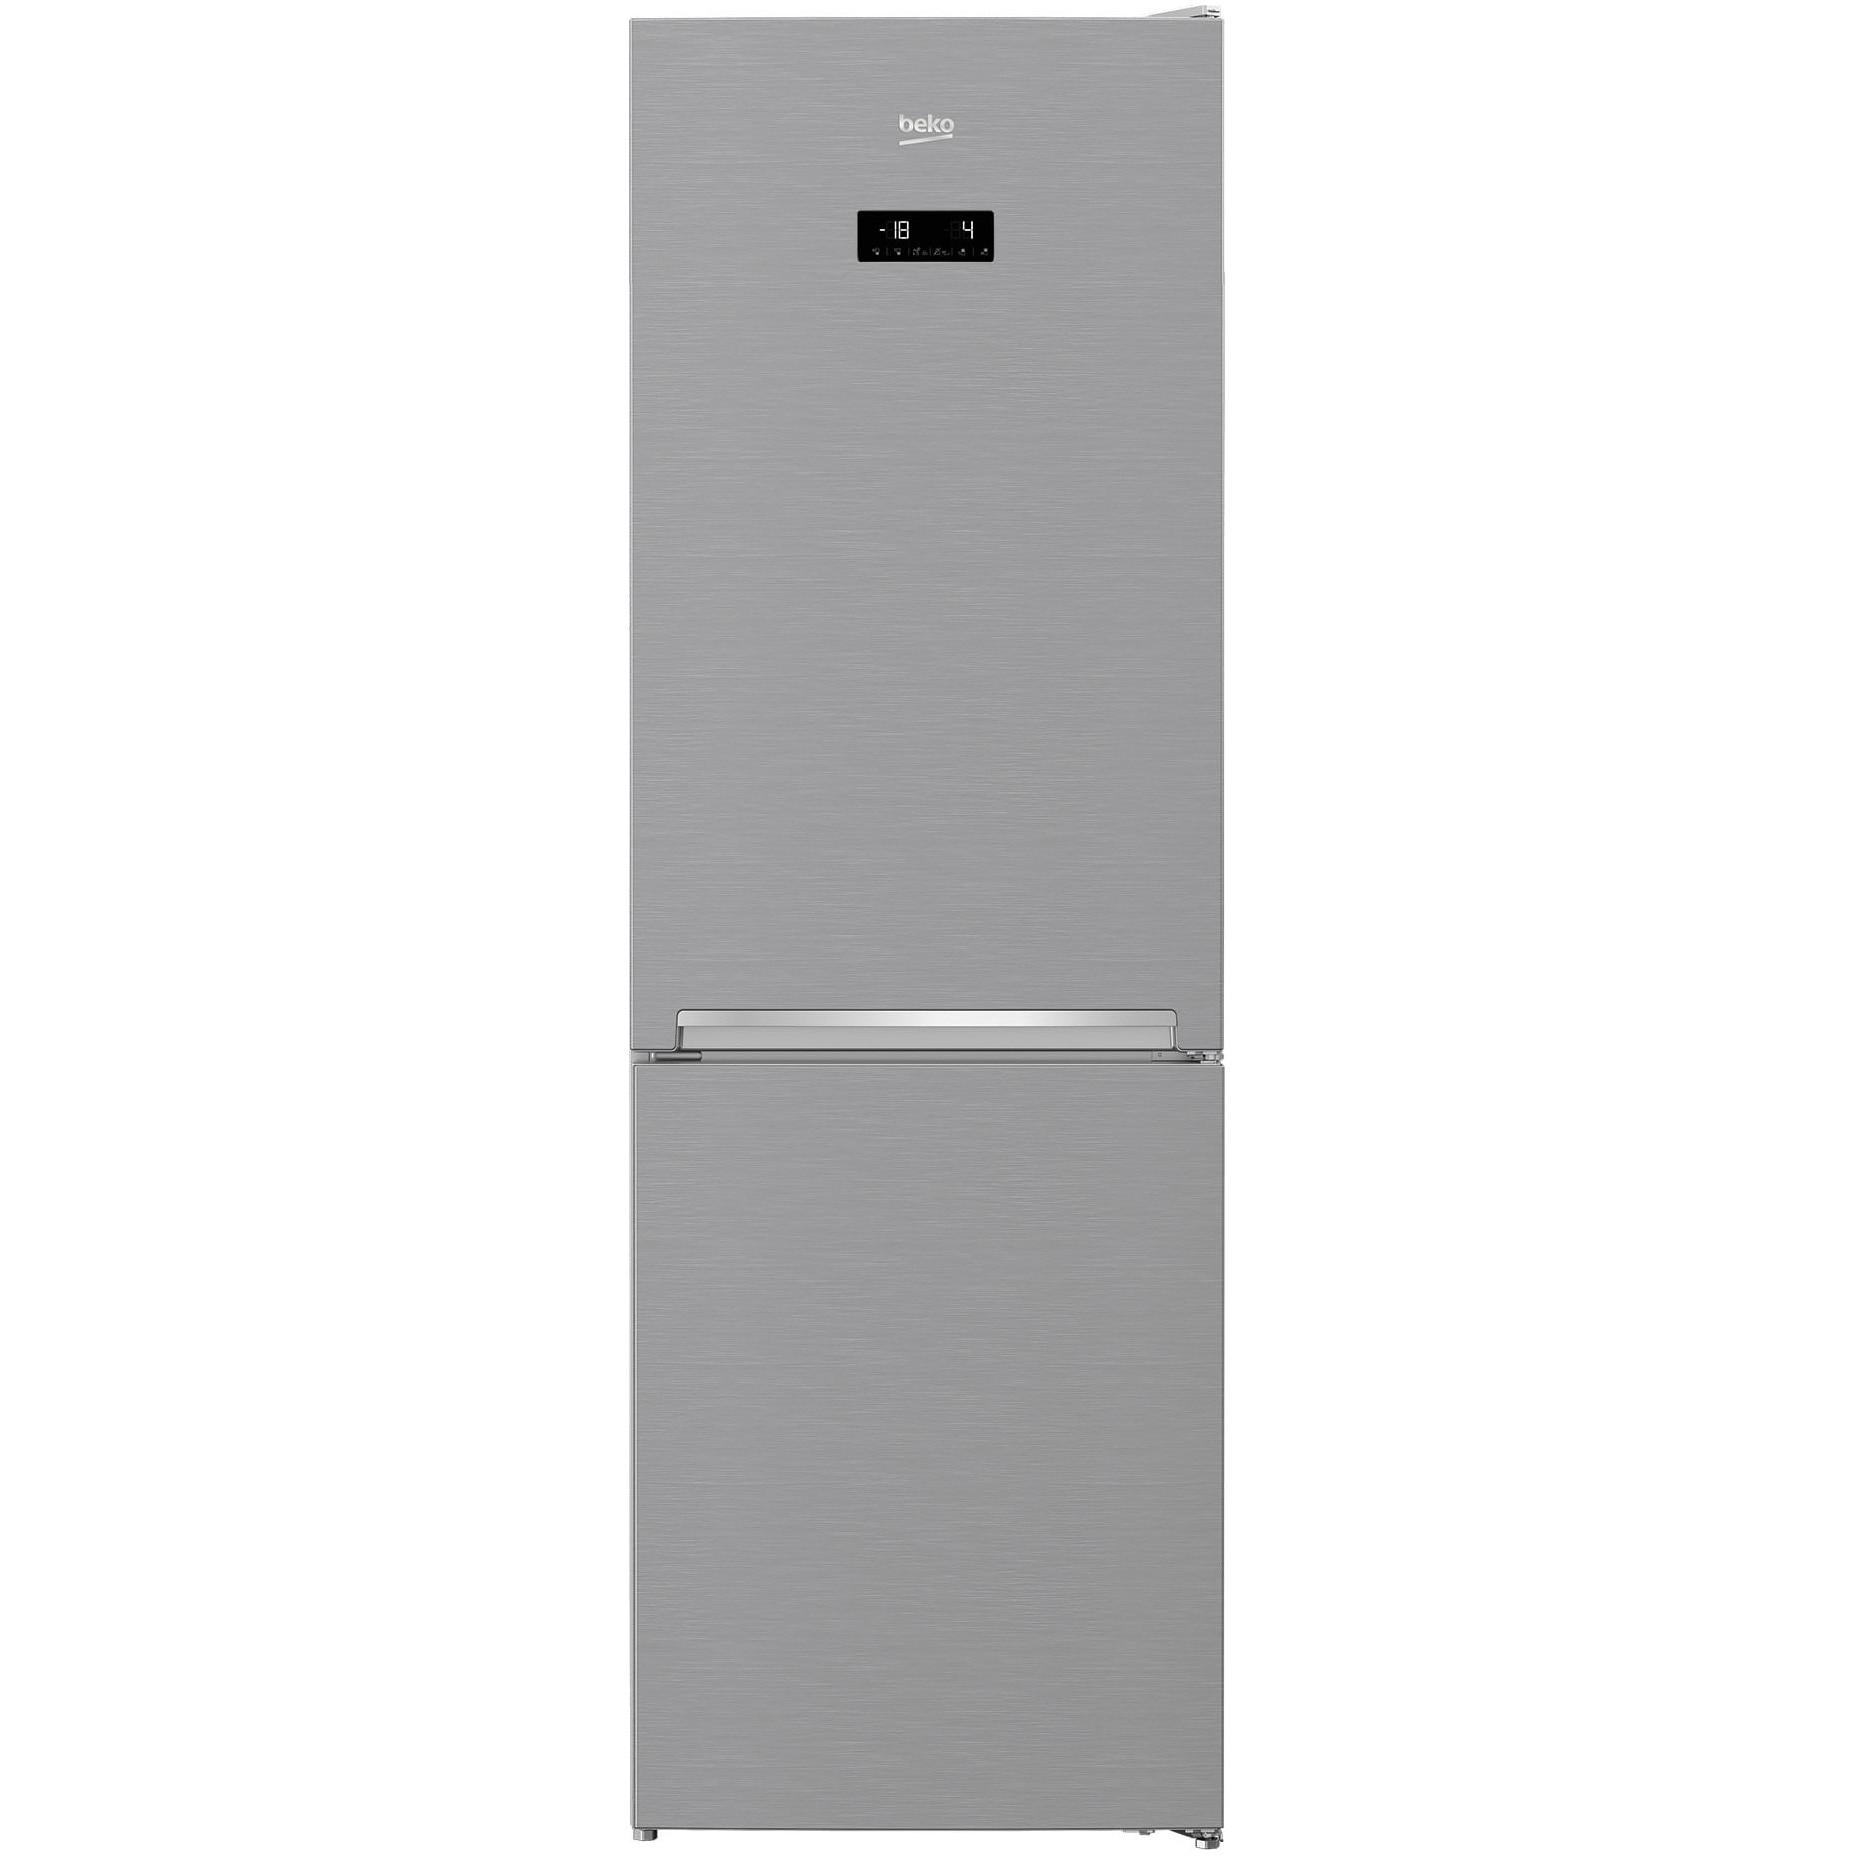 Fotografie Combina frigorifica Beko RCNA366E40ZXBN, 324 l, Neo Frost, Touch control, HarvestFresh, Clasa E, H 185 cm, Argintiu